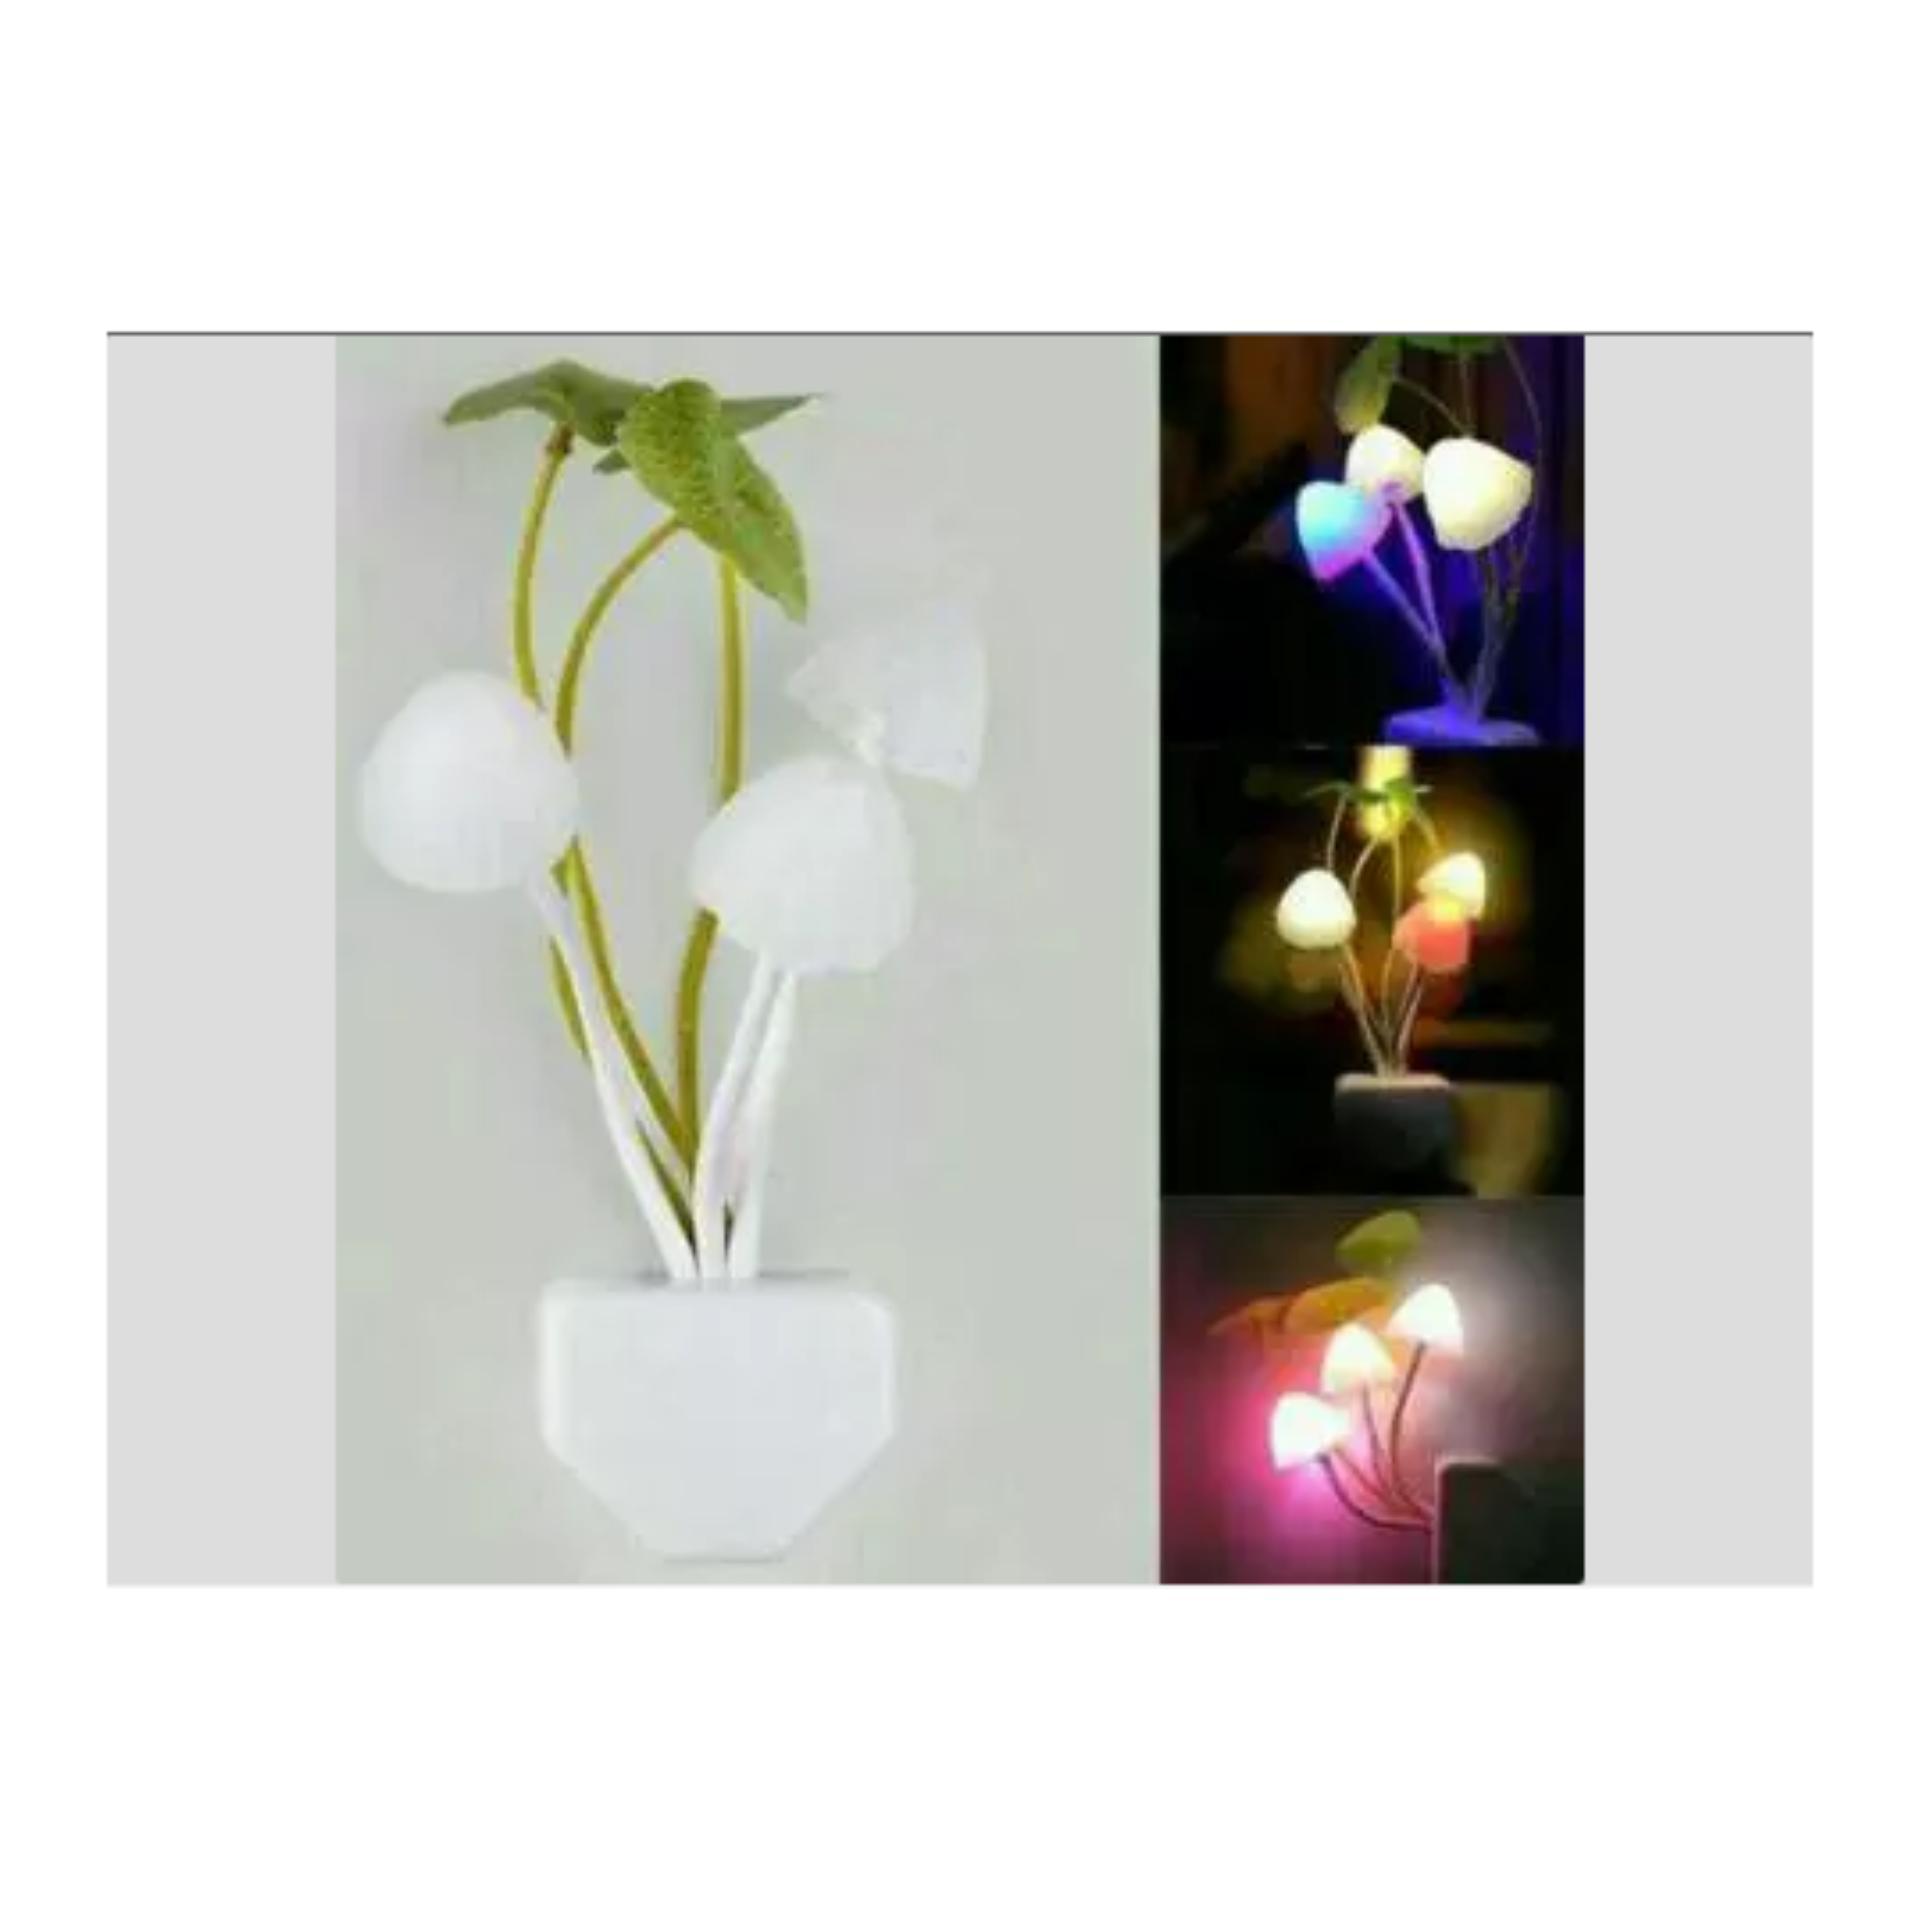 Lampu Hias Kamar Tidur Sensor Gelap